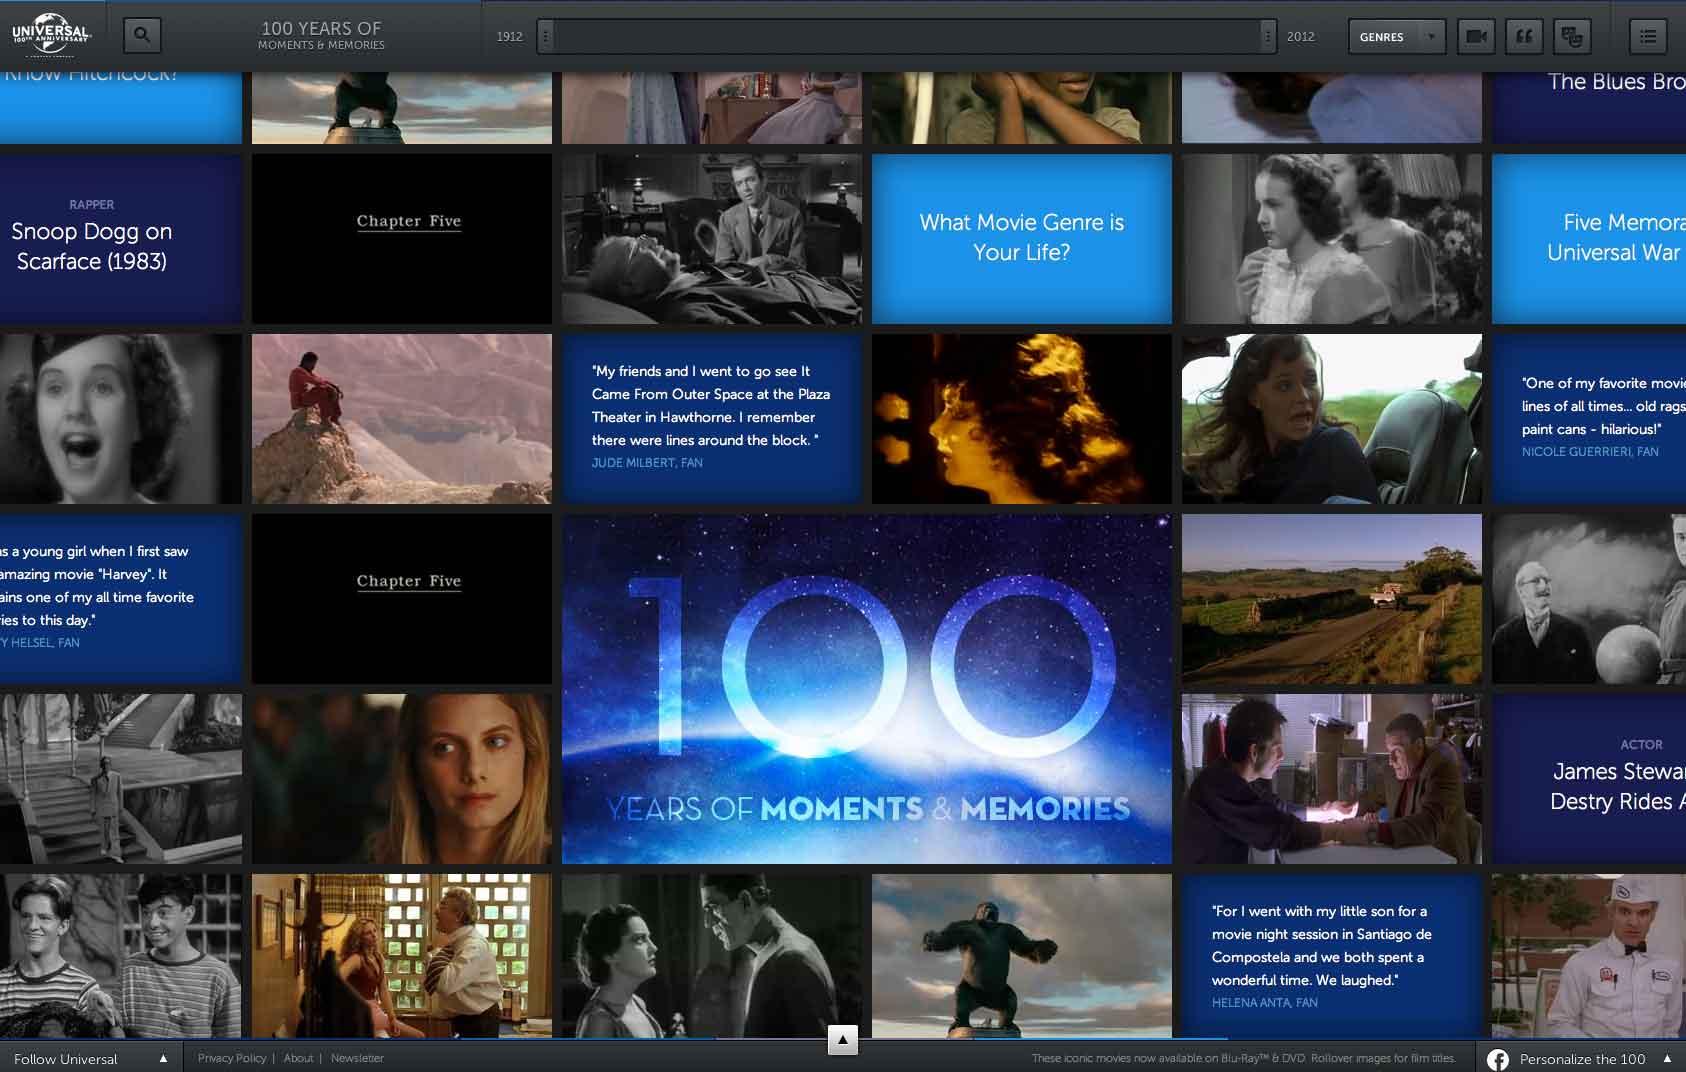 Universal 100th